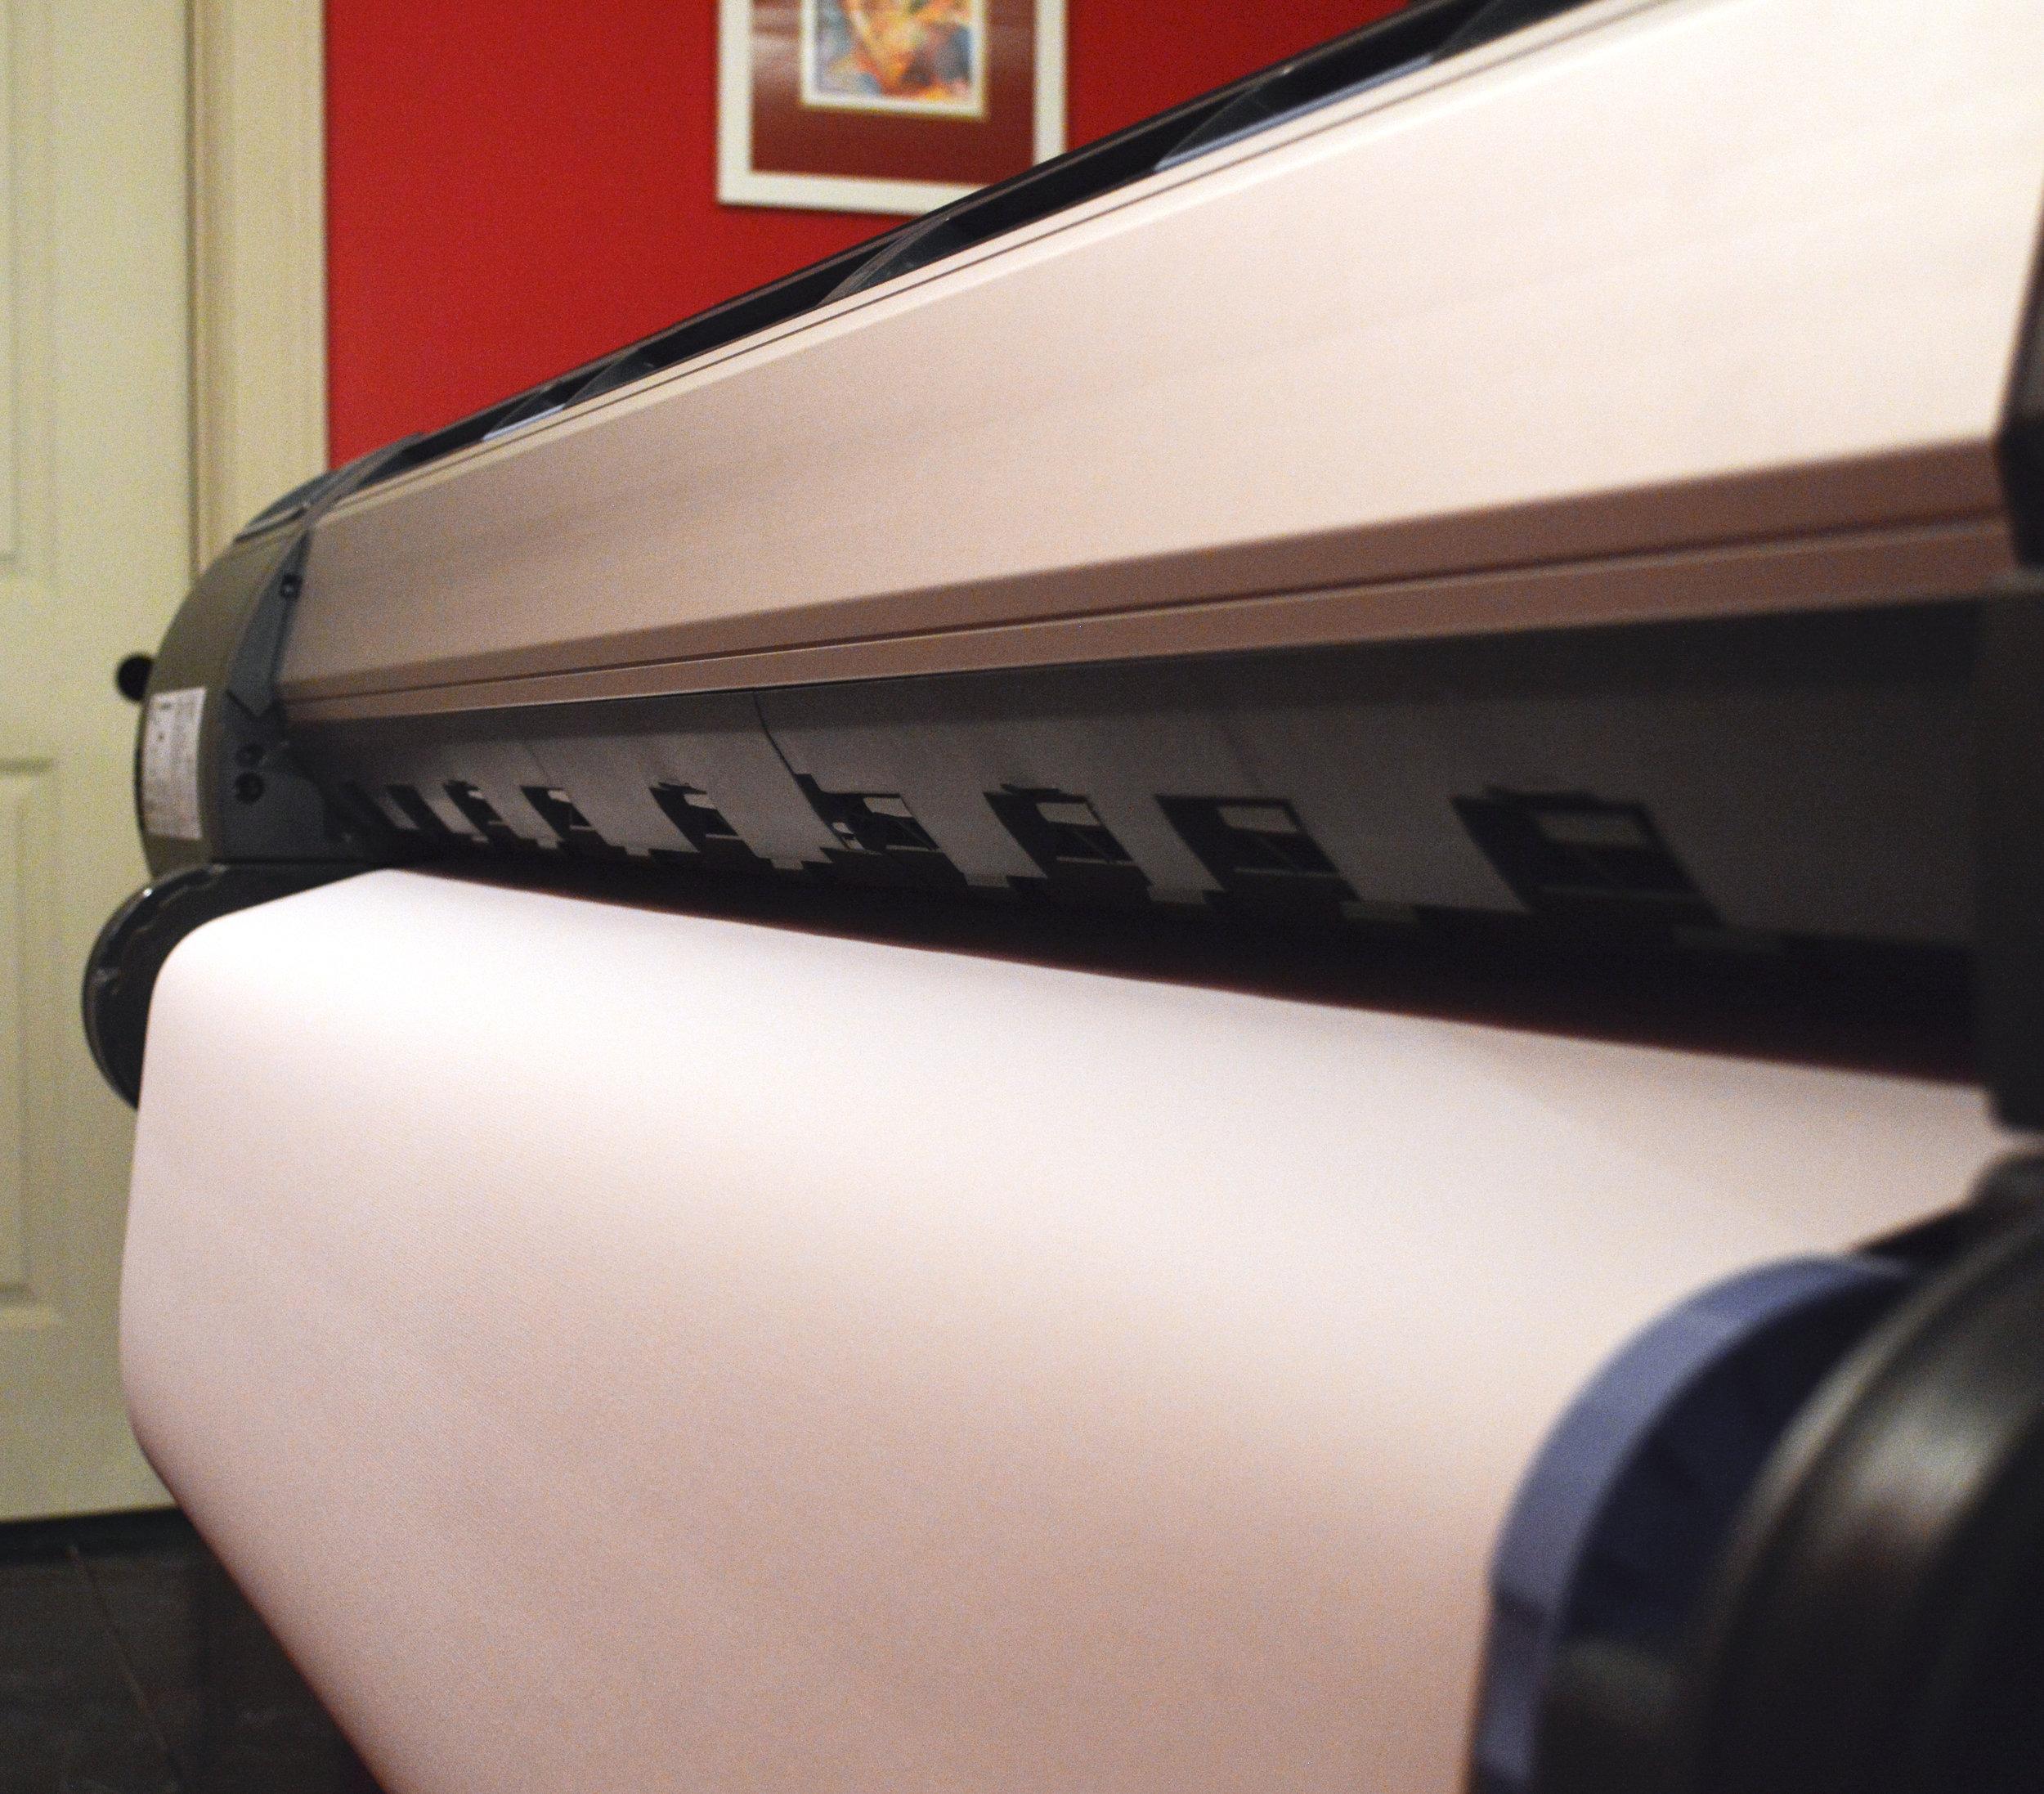 Printer2.JPG